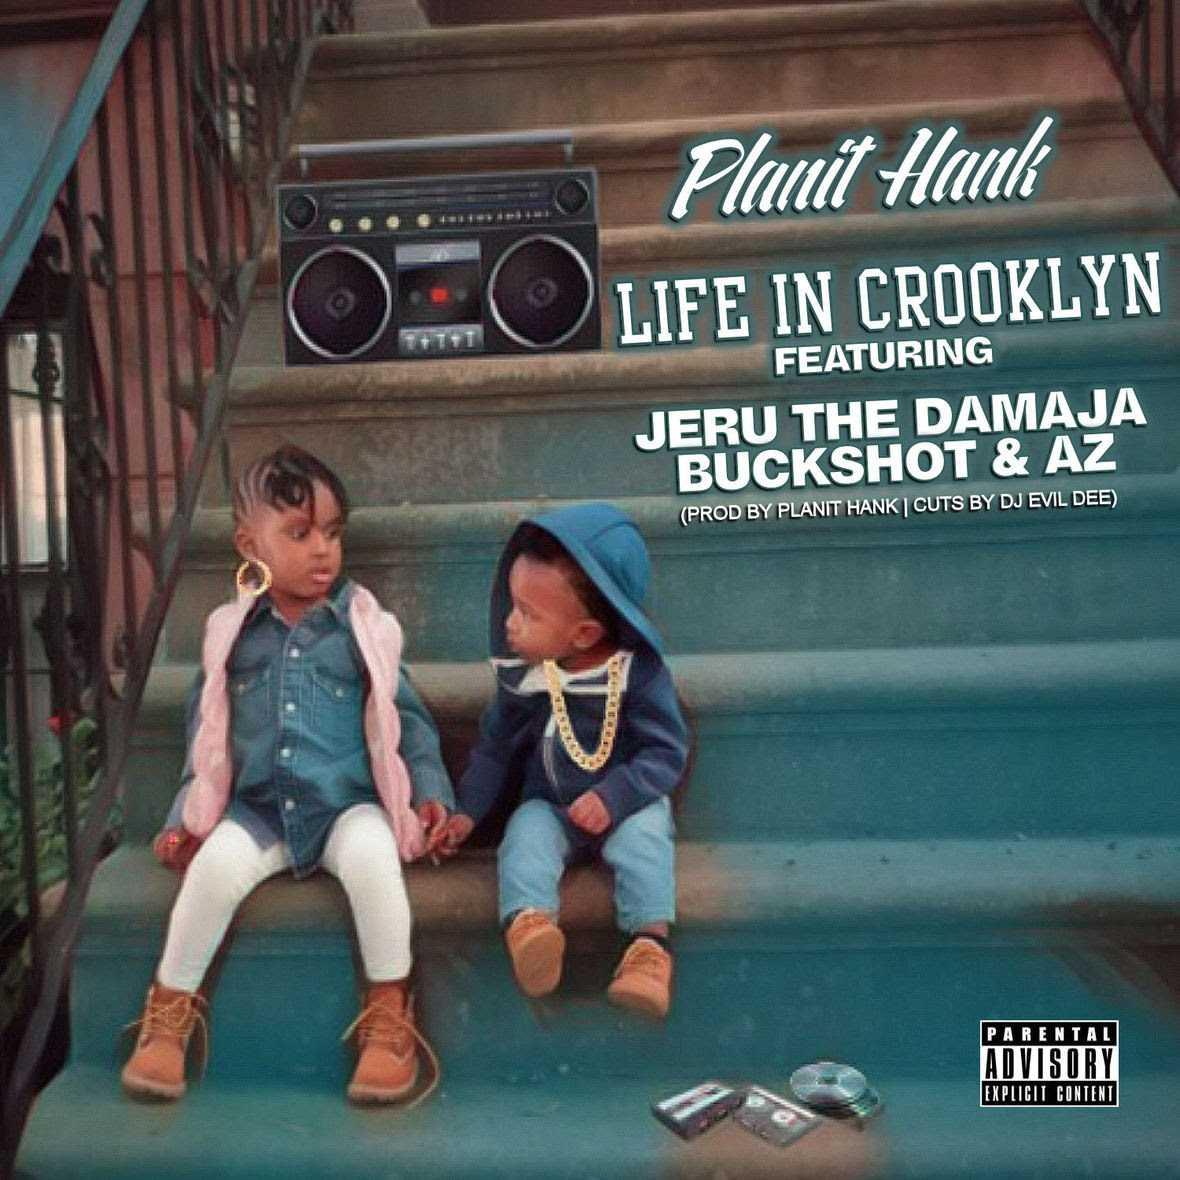 "Planit Hank feat. Jeru The Damaja , Buckshot & AZ ""Life in Crooklyn"" [Audio]"